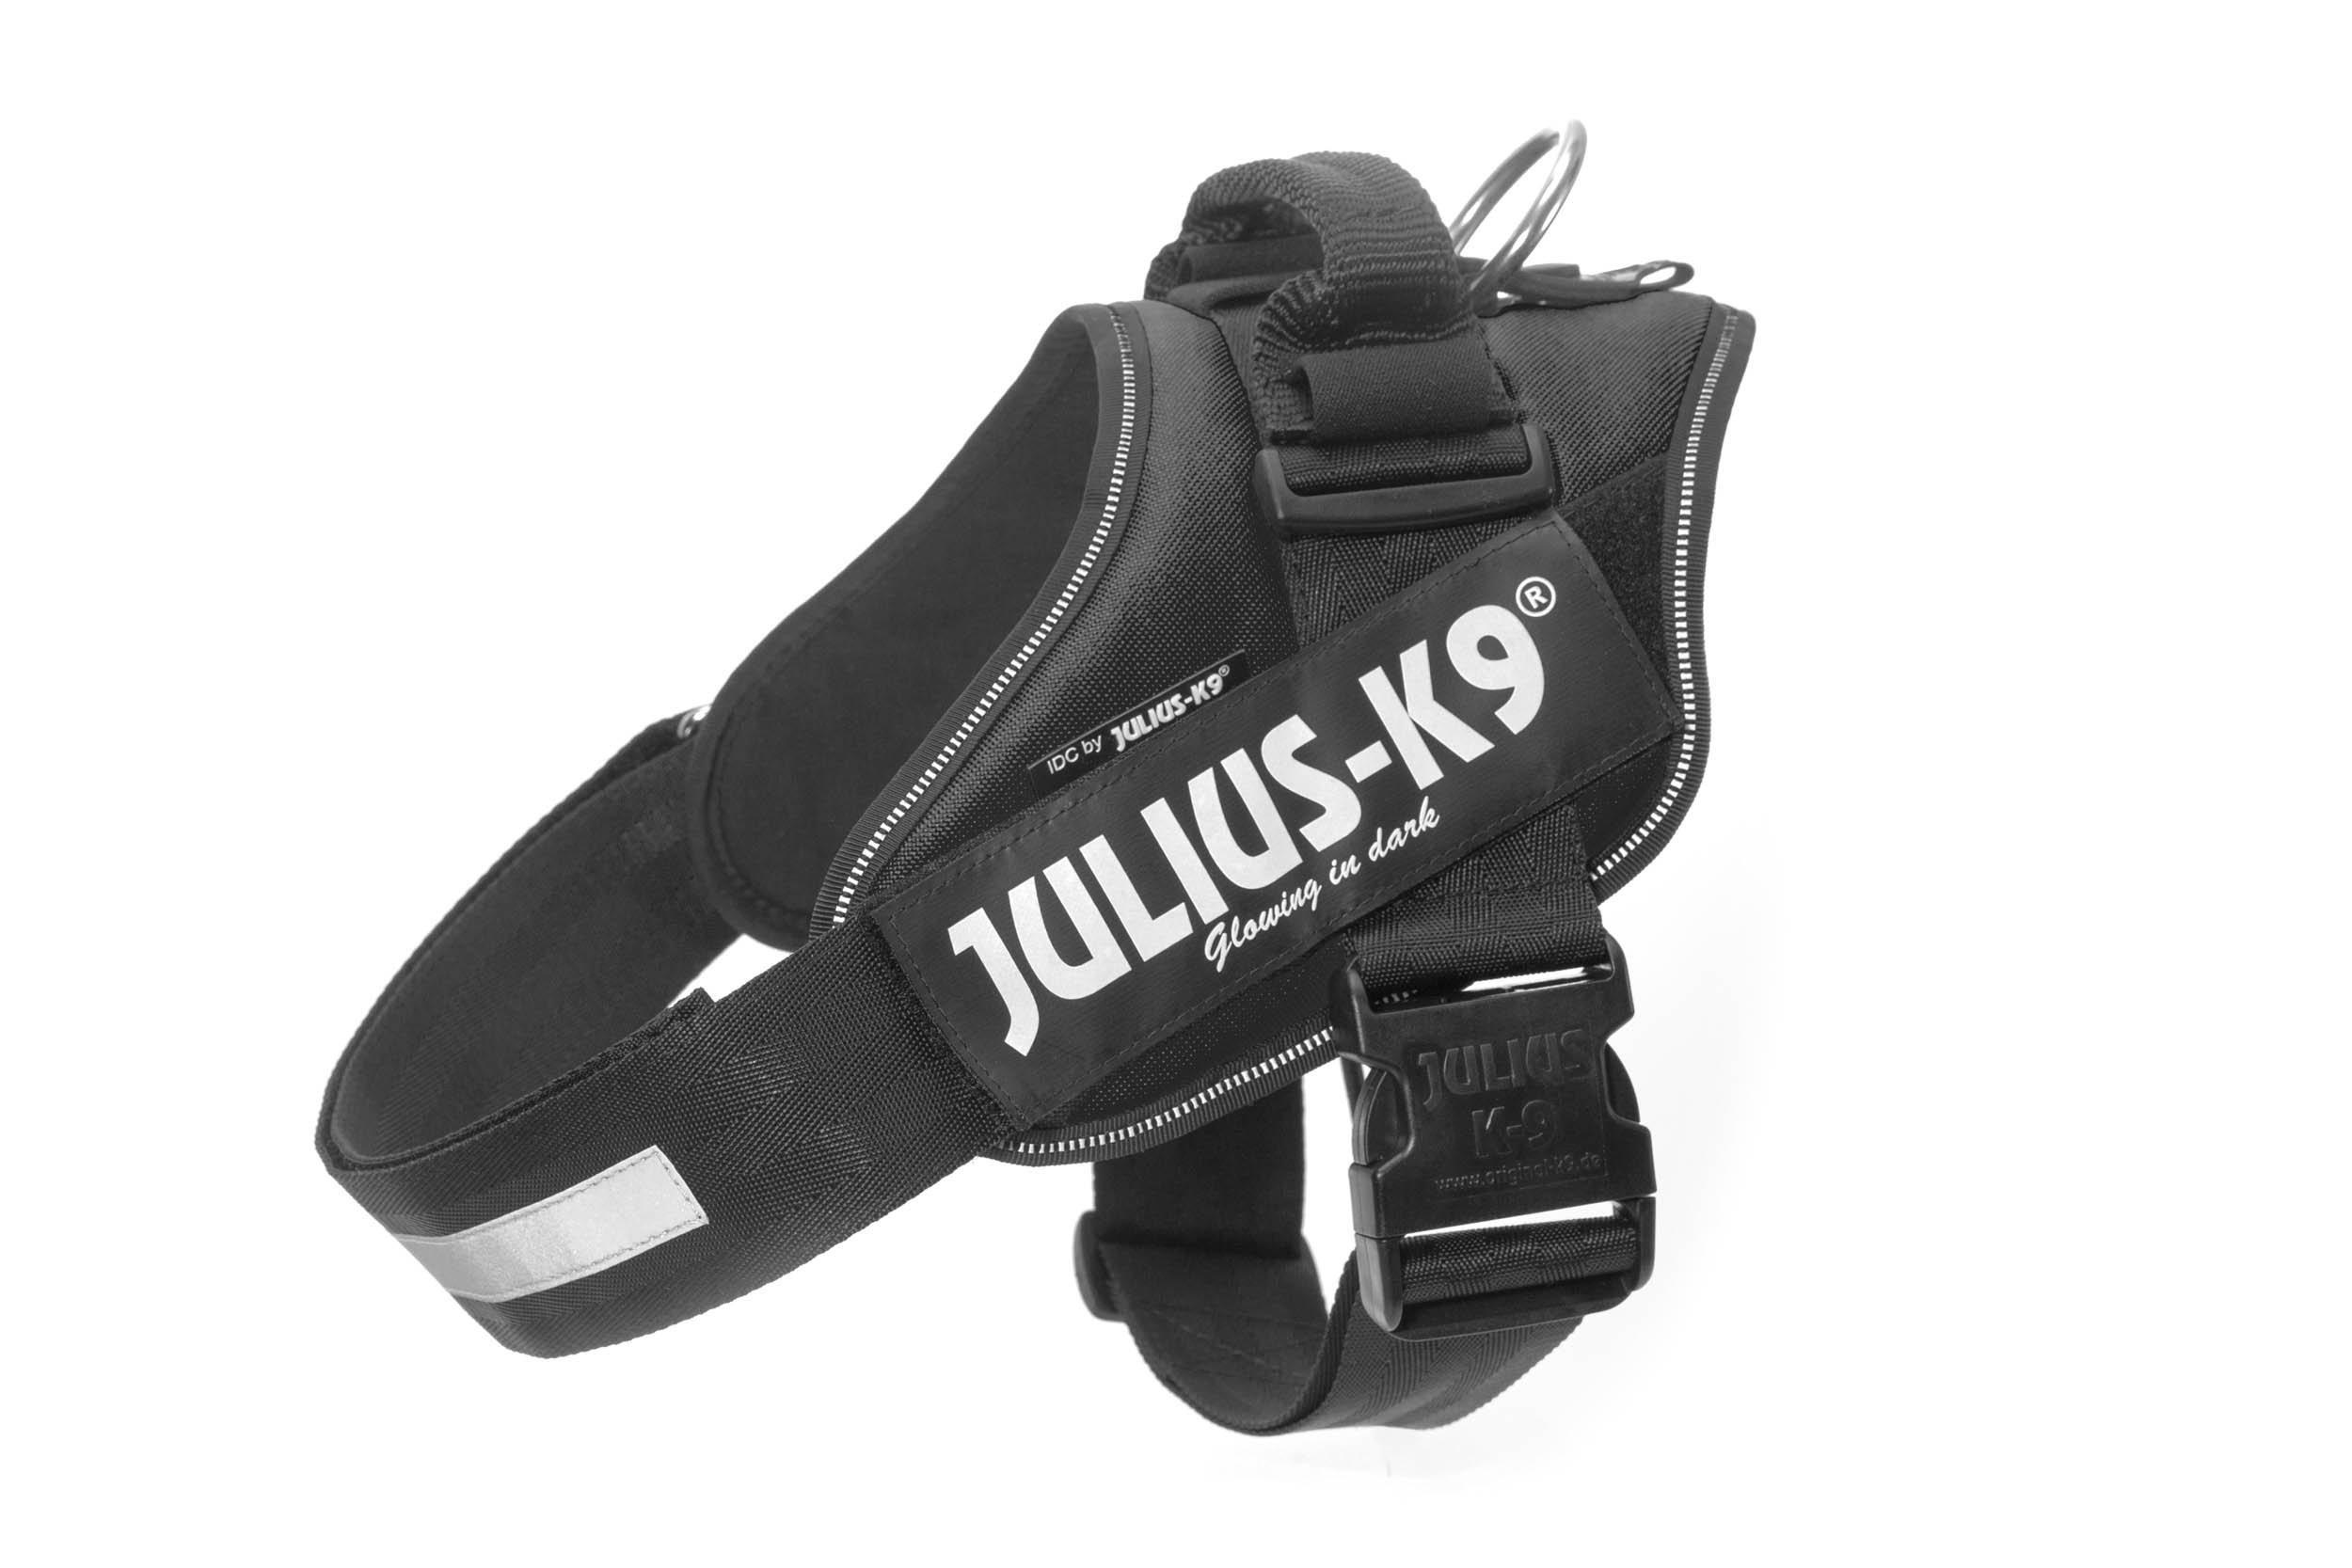 Julius-K9, 16IDC-P-2, IDC Powerharness, dog harness, Size: 2, Black by Julius-K9